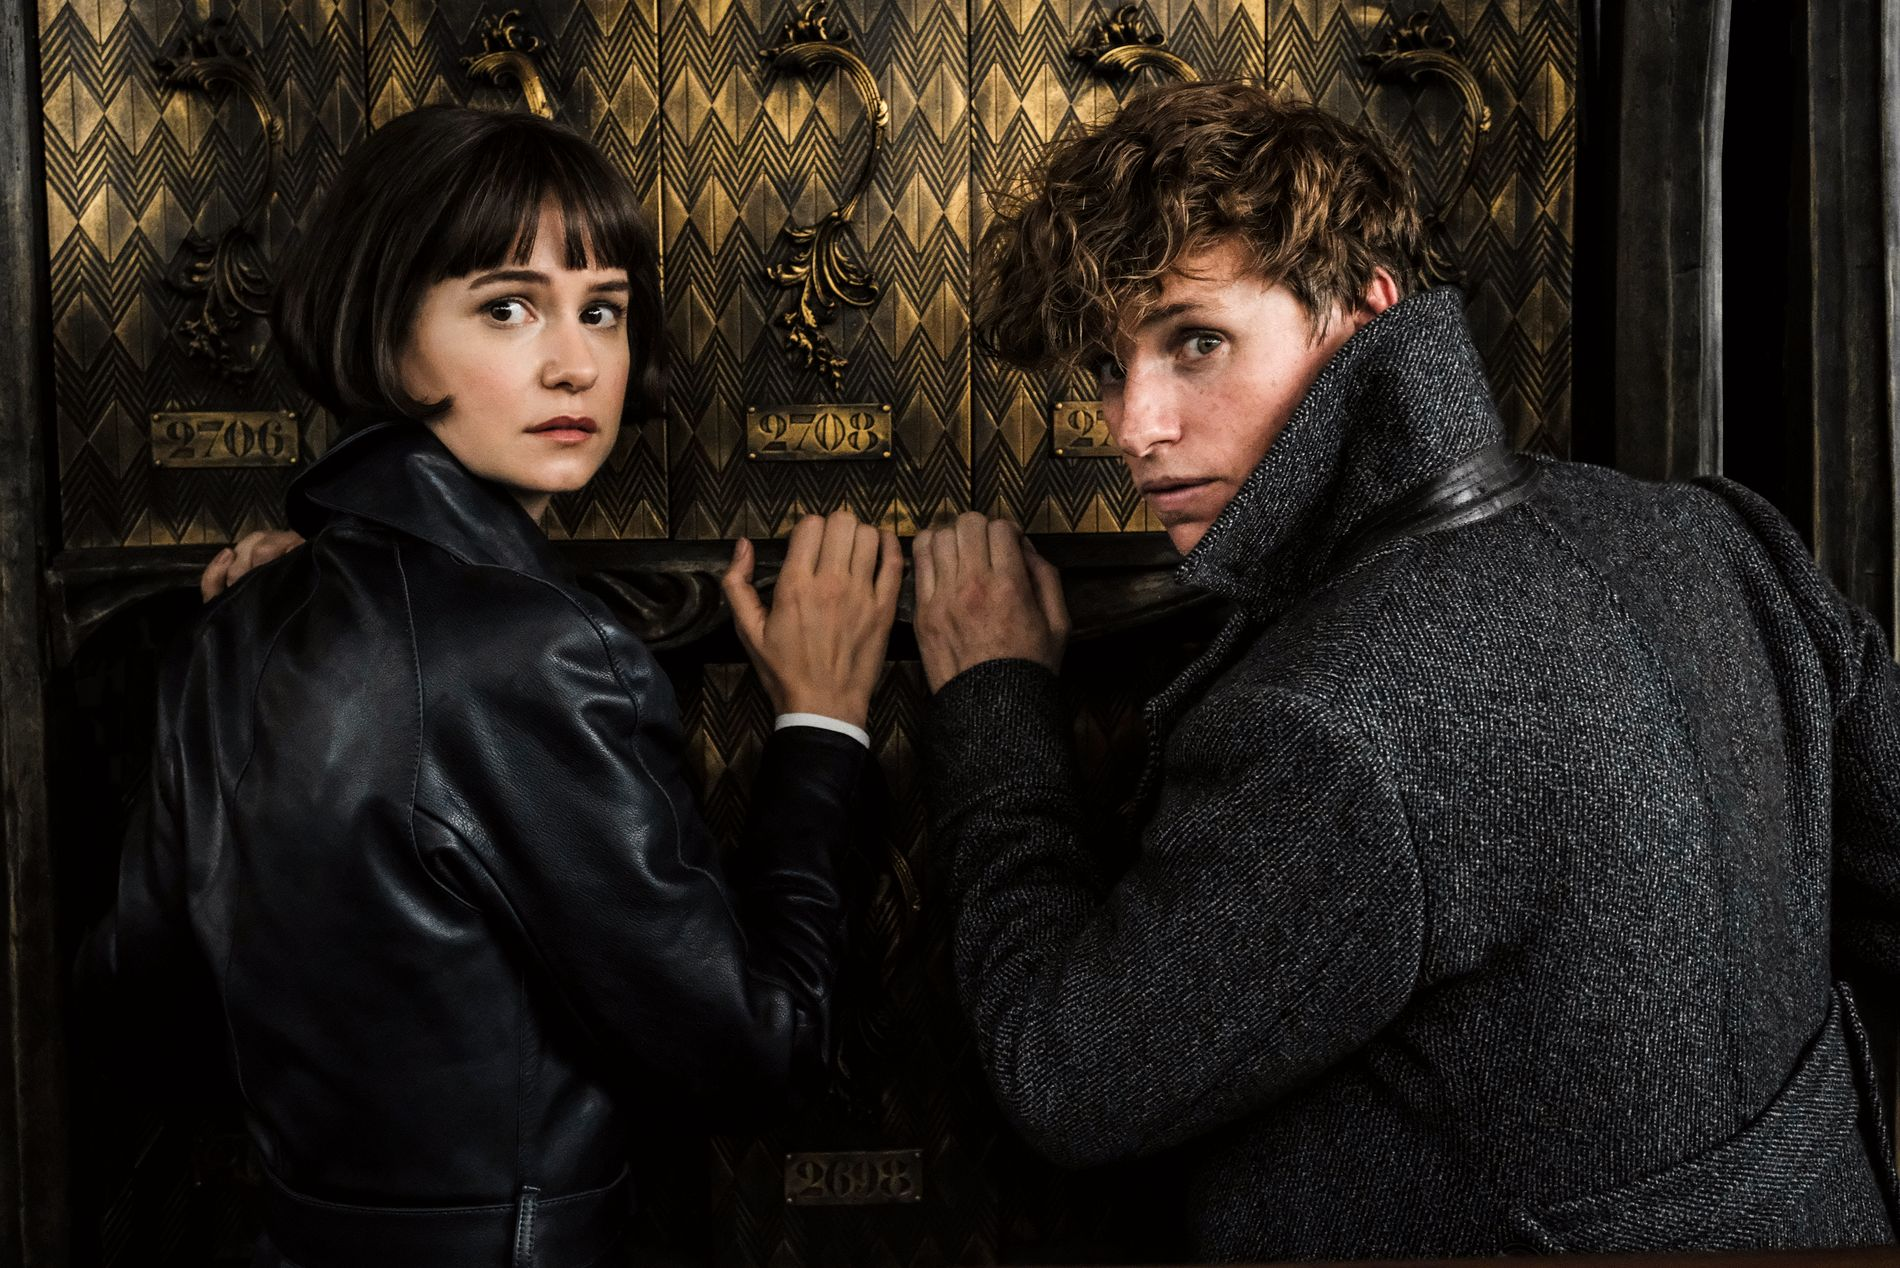 GOLDEN: Porpentina Goldstein (Katherine Waterston) and Salmander Fisle (Eddie Redmayne) fail to recreate the golden magic of the former film.